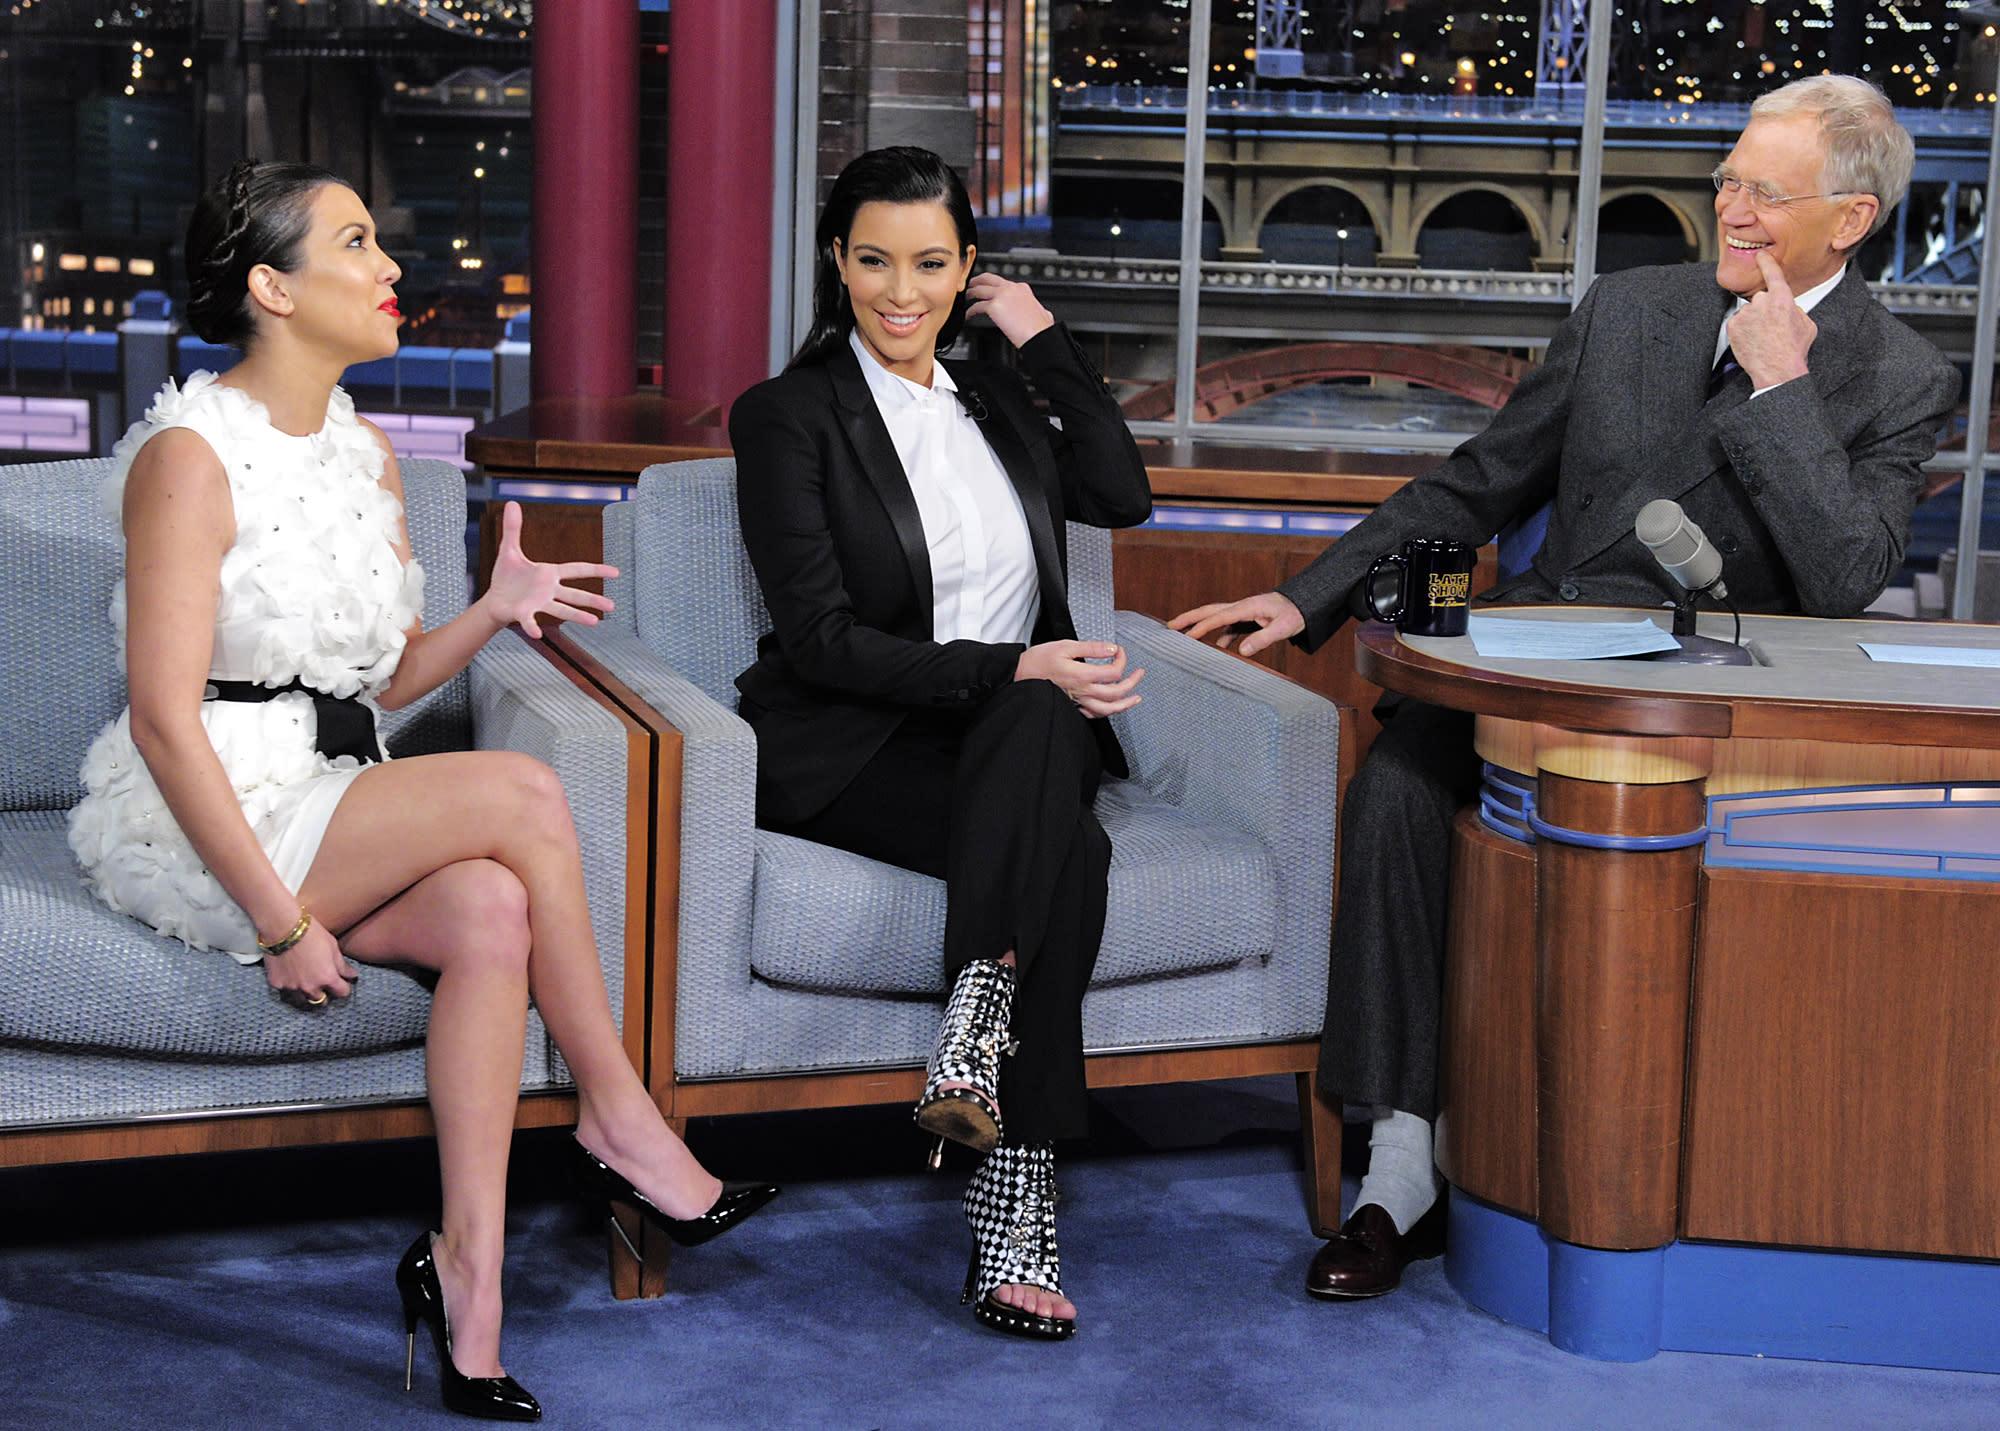 David Letterman says he 'misjudged' Kim Kardashian: 'I had used her as a joke'